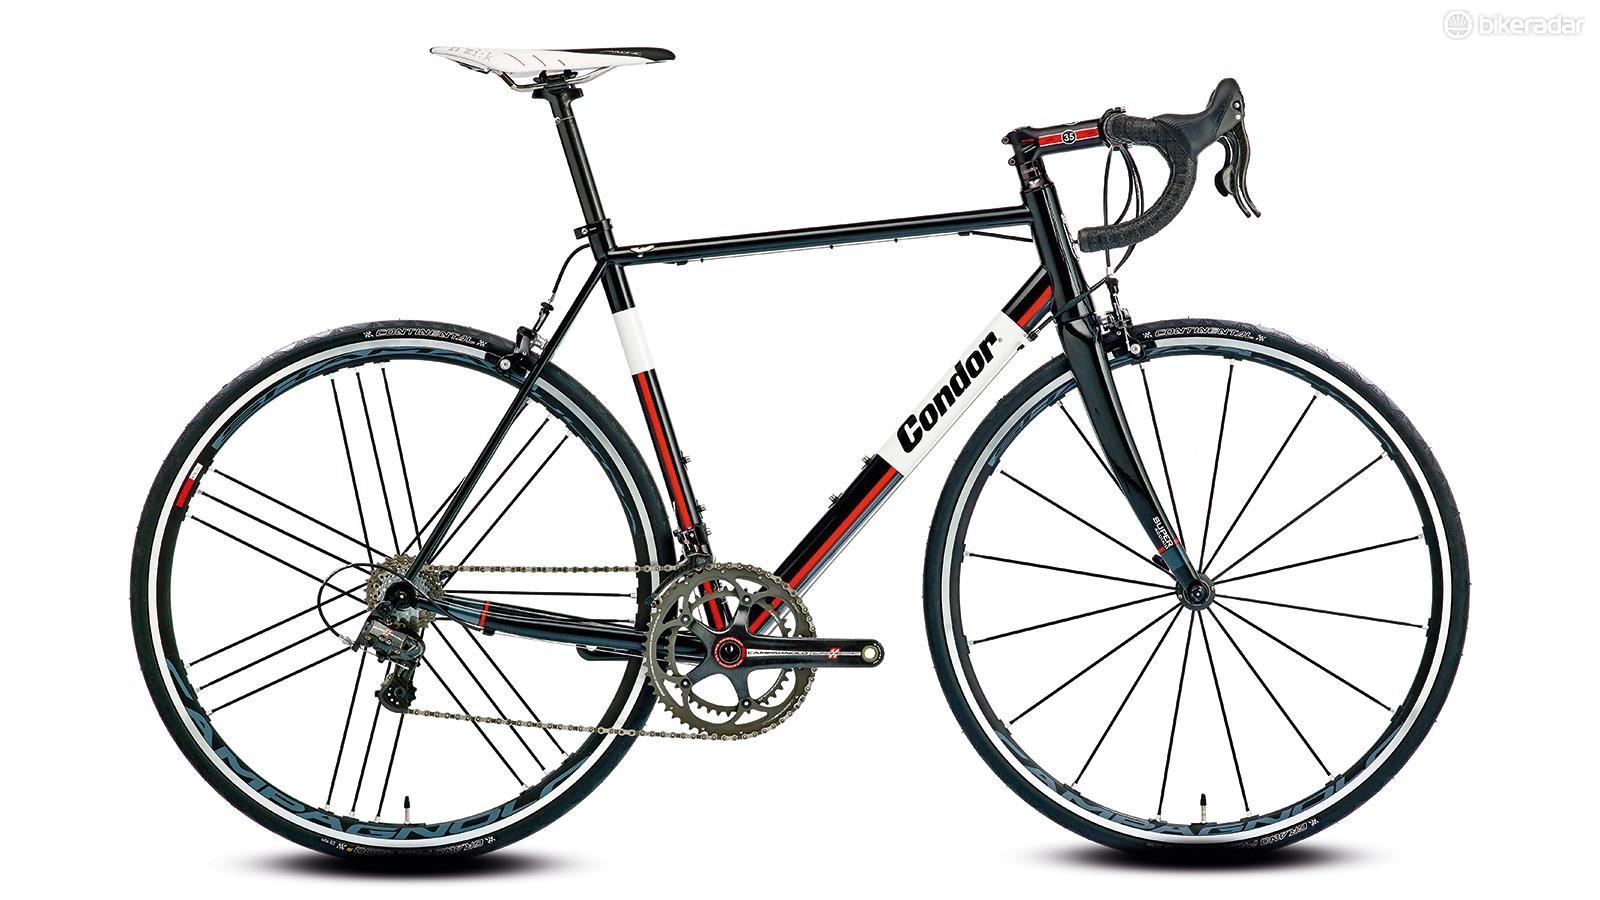 Condor's Super Acciaio is no ordinary steel bike